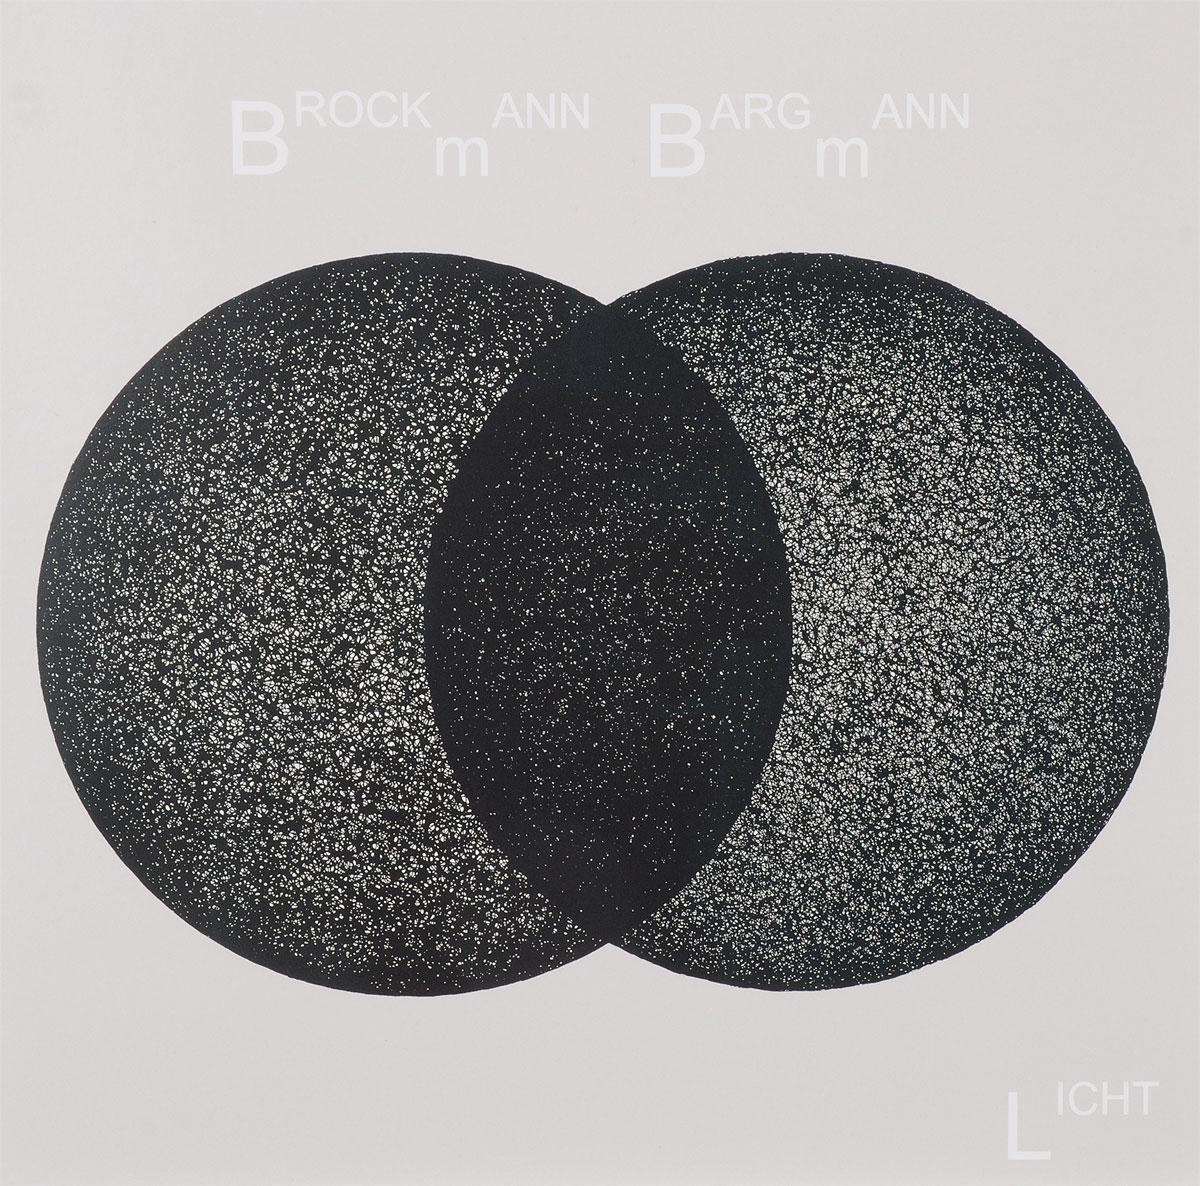 Brockmann / Bargmann. Licht (LP) kollektion 04 b lp